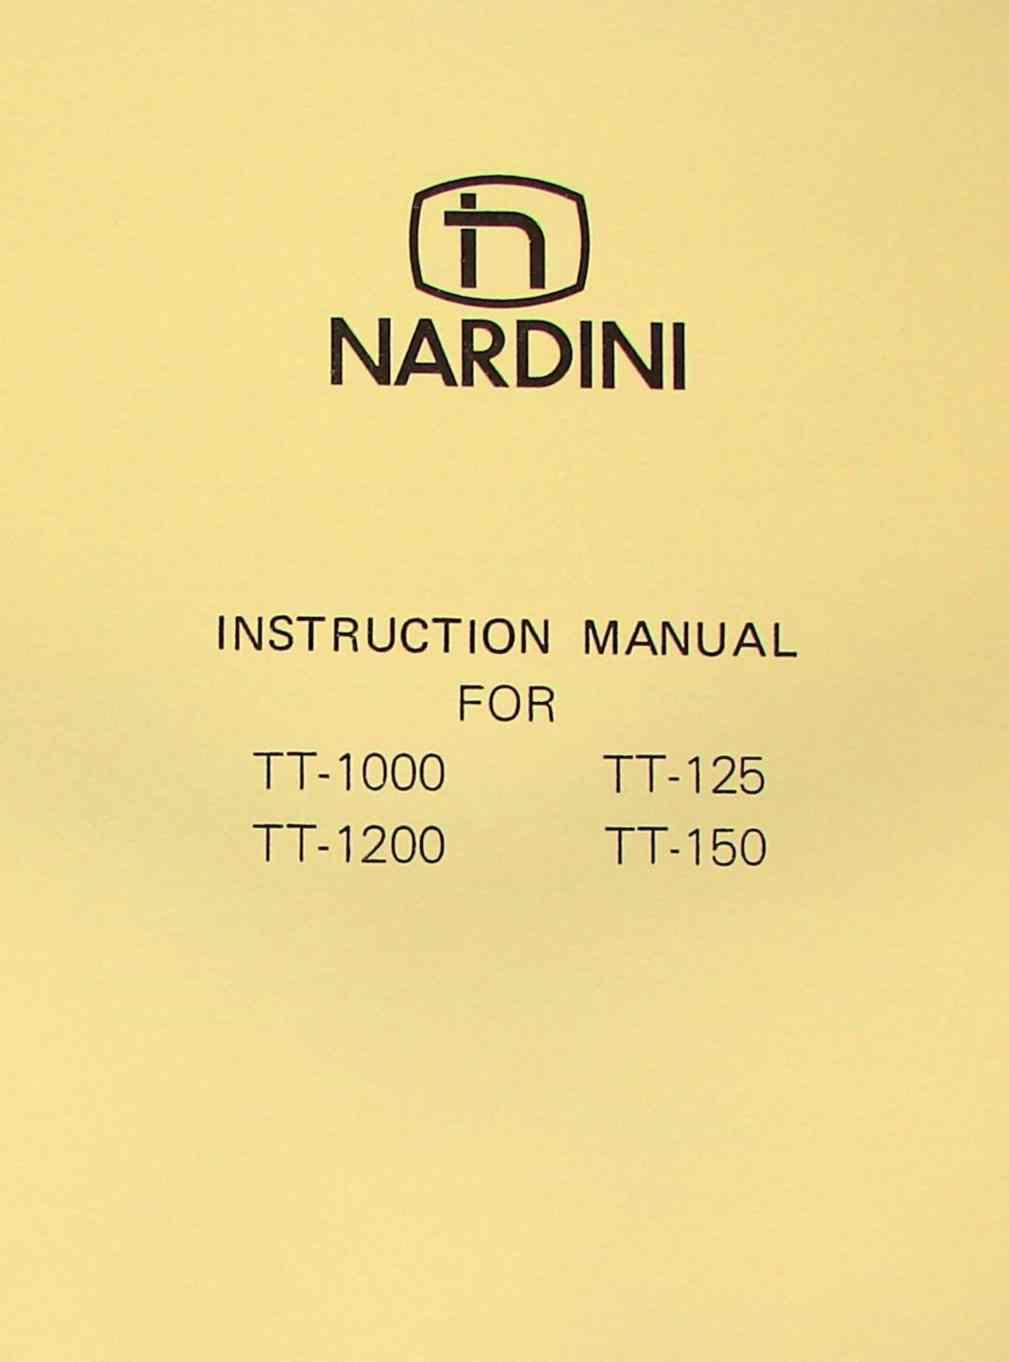 nardini tt 1000 1200 125 150 operator s part manual ozark tool rh ozarktoolmanuals com nardini ms 1440 manual